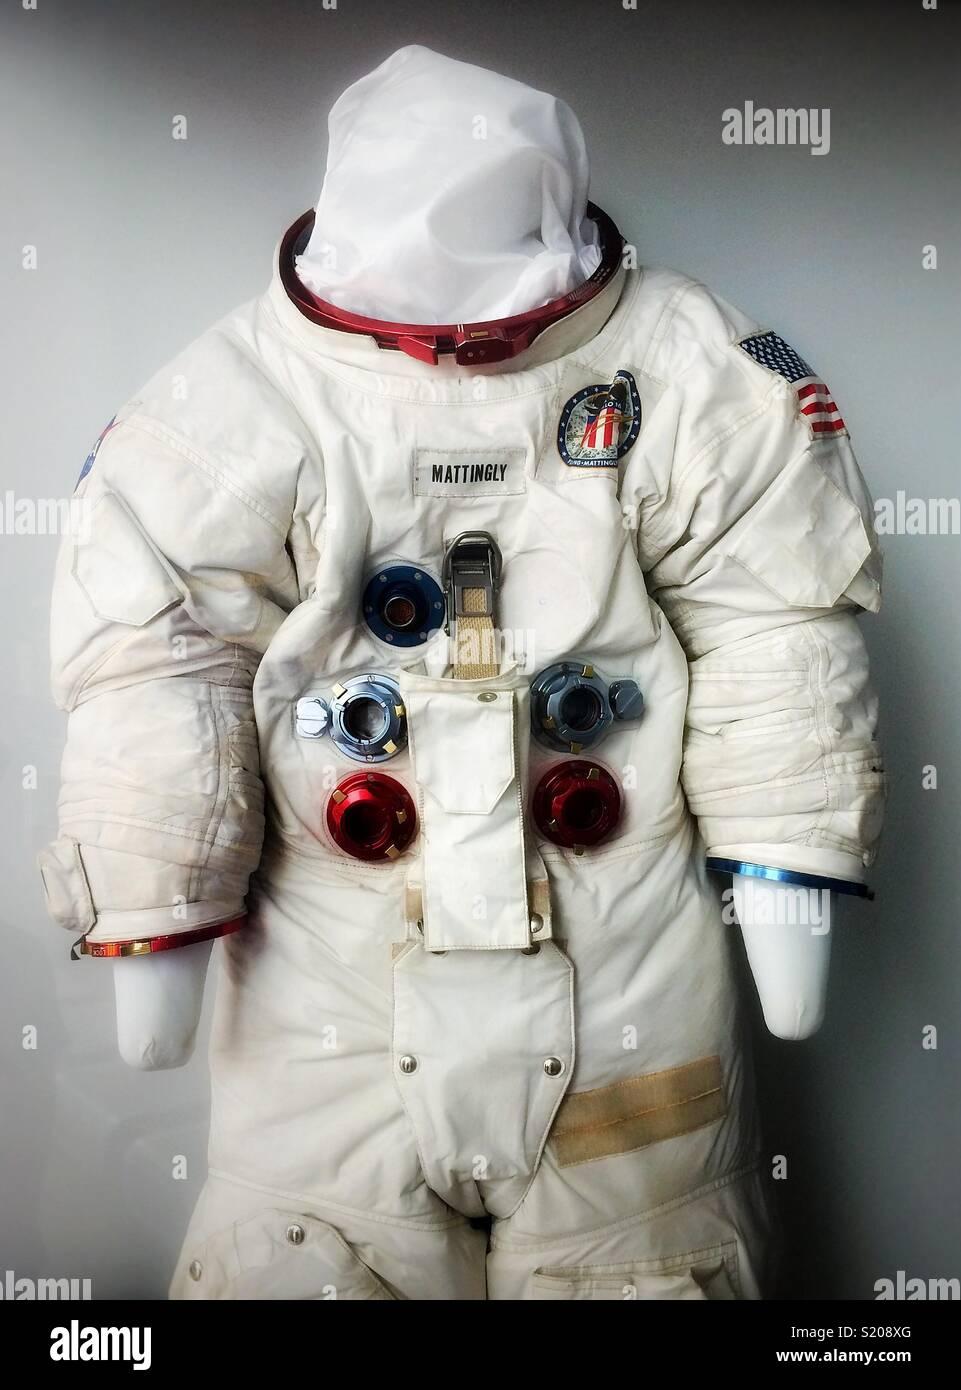 Astronaut Ken Mattingly den Raumanzug geschaut im Science Museum von Los Angeles, Kalifornien, USA Stockbild